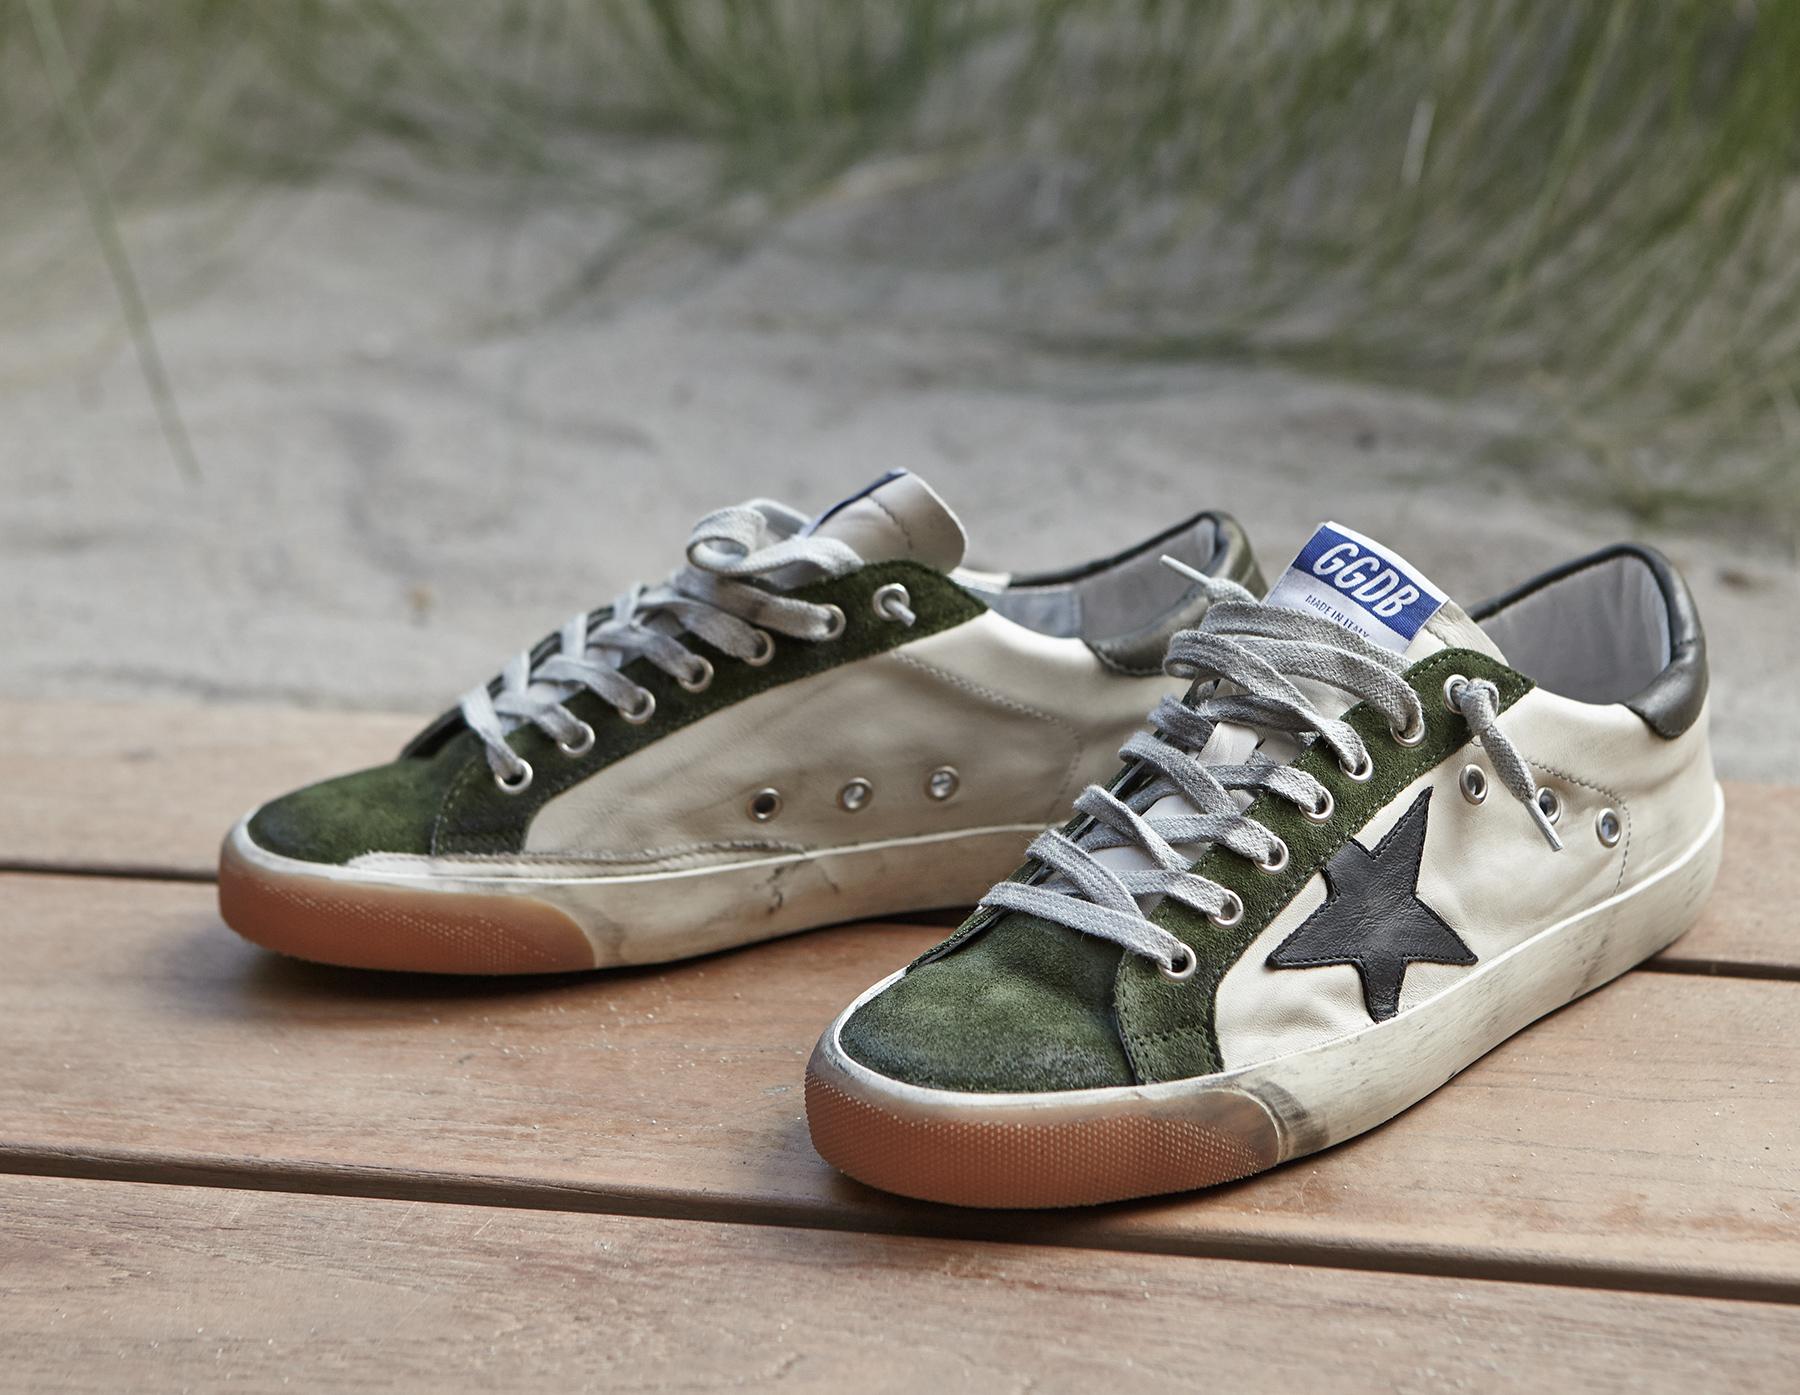 Mens Mens Superstar Leather & Suede Sneakers Golden Goose N5HY6I